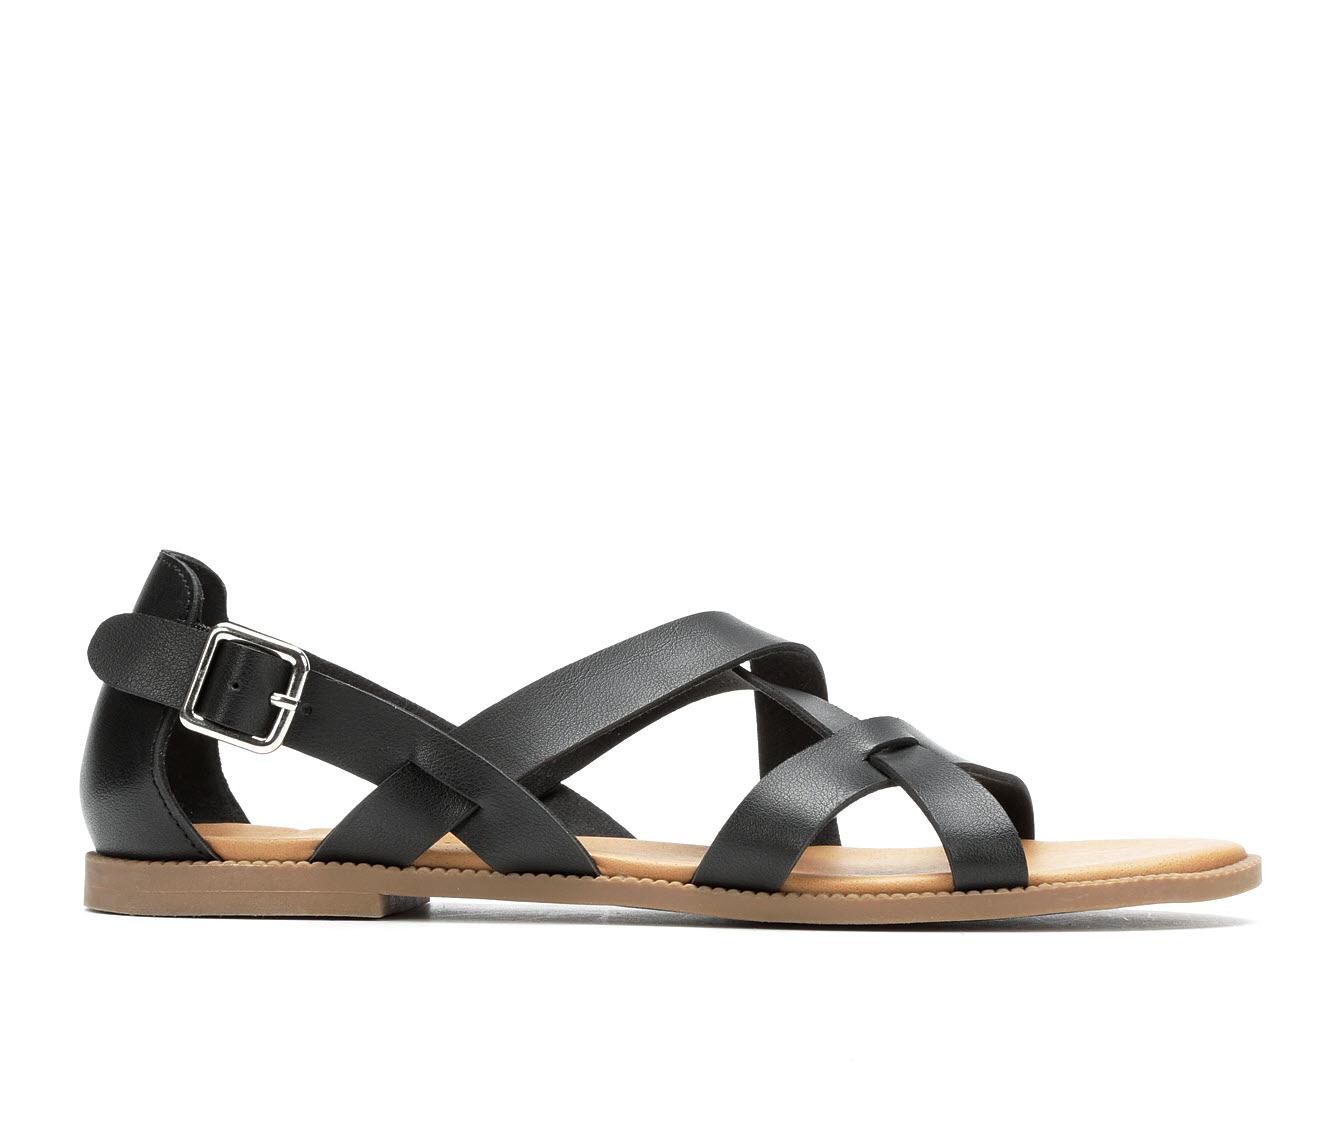 Andiamo Corn Women's Sandal (Black Faux Leather)